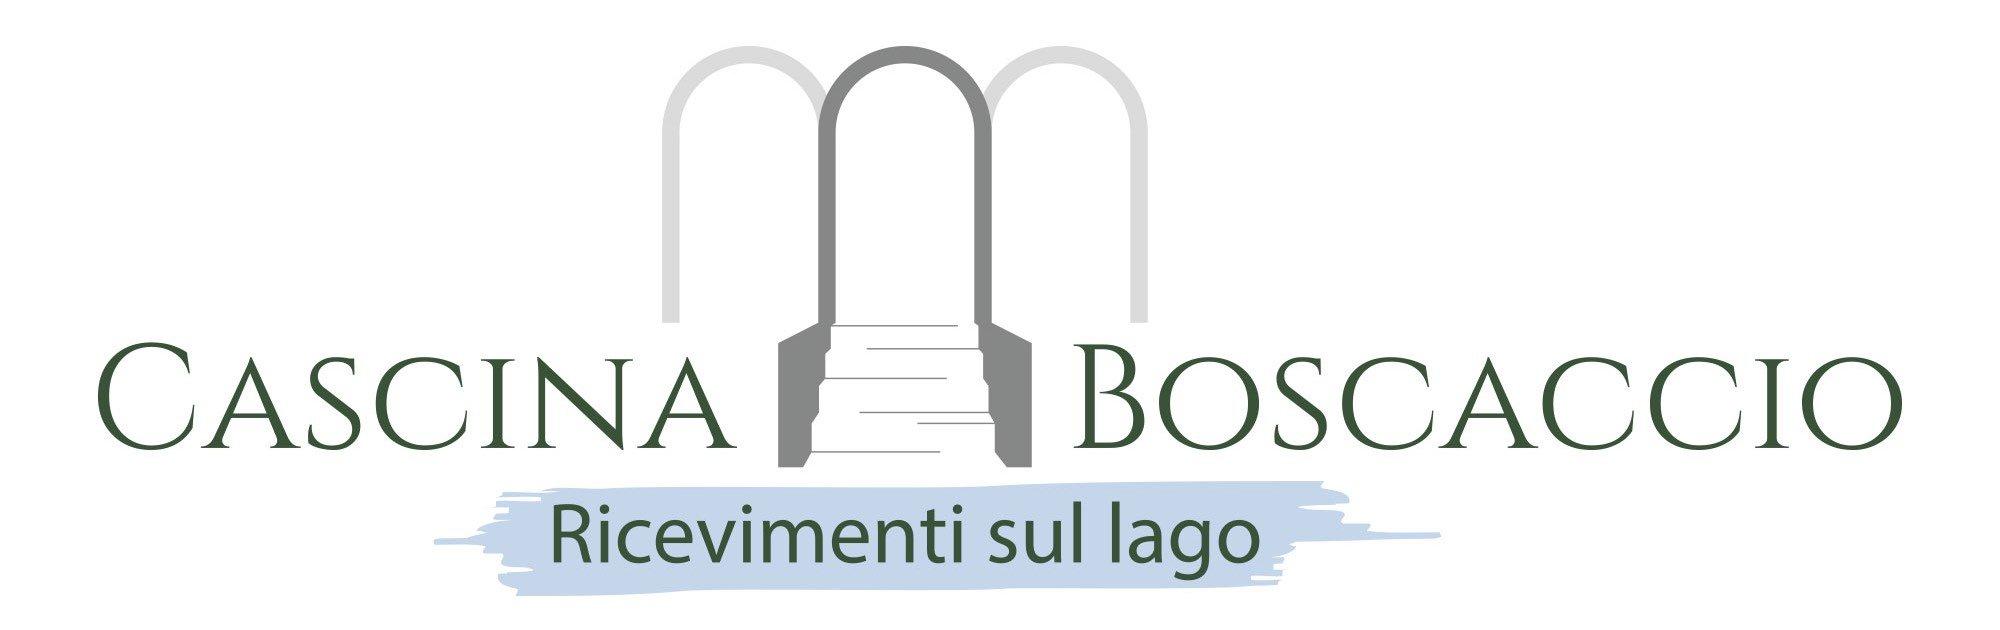 Cascina Boscaccio